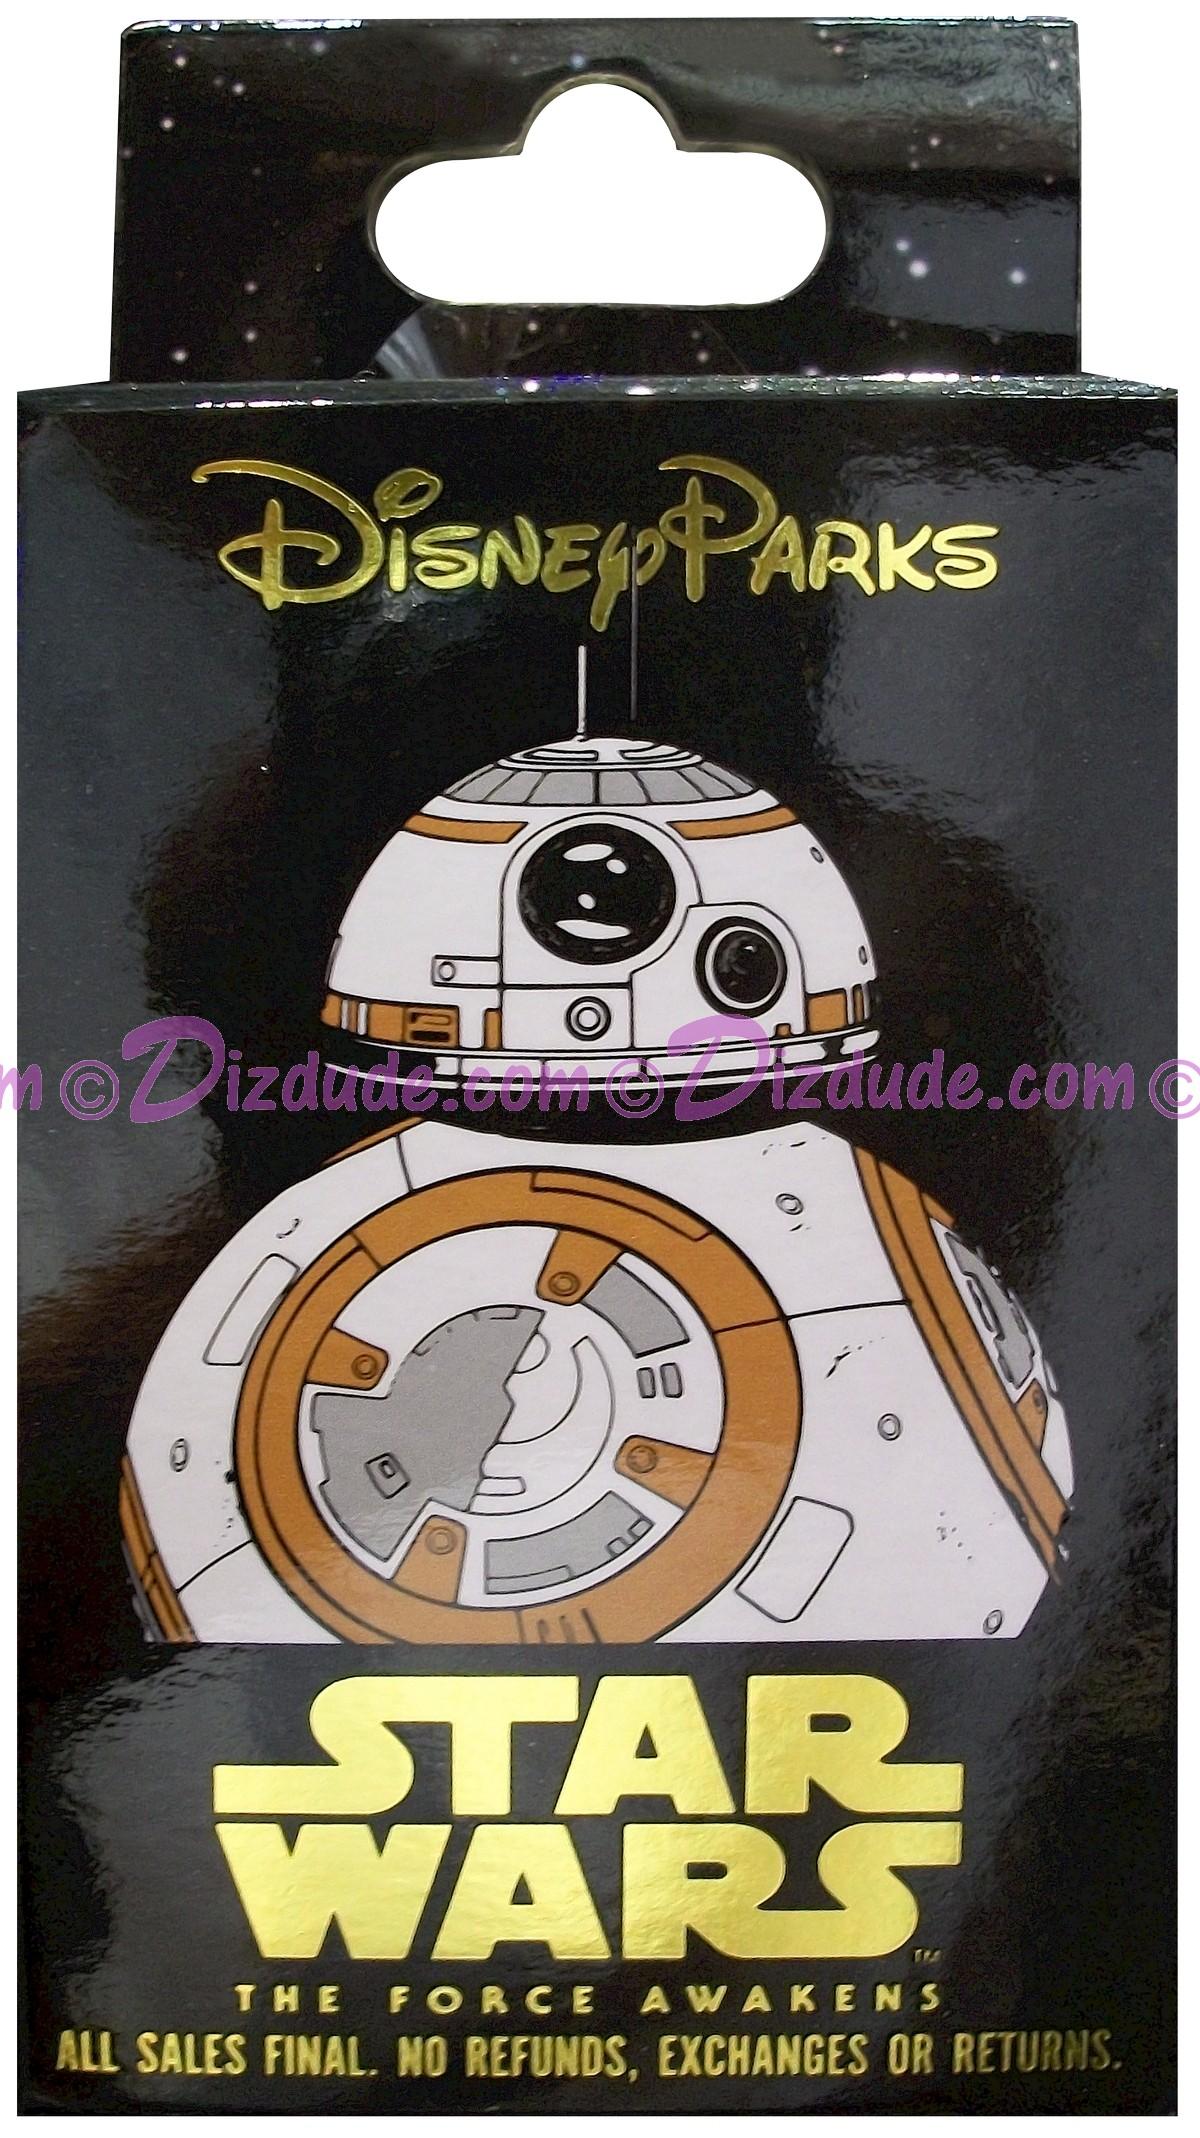 Star Wars The Force Awakens Mystery Box Pin Collection ~ Each Box Has 2 Random Pins © Dizdude.com